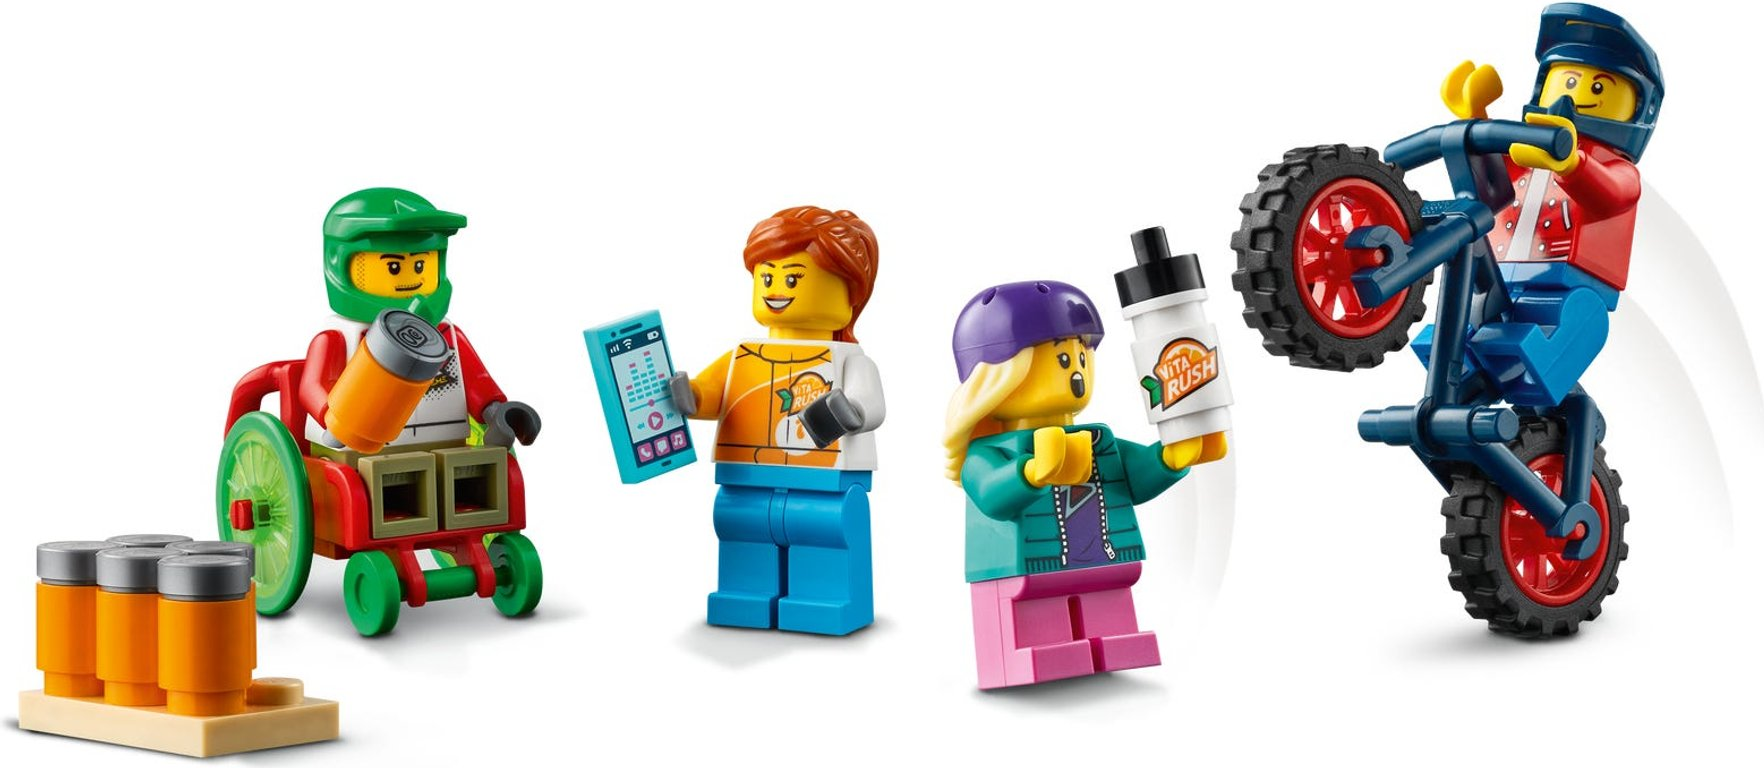 LEGO® City Skate Park minifigures